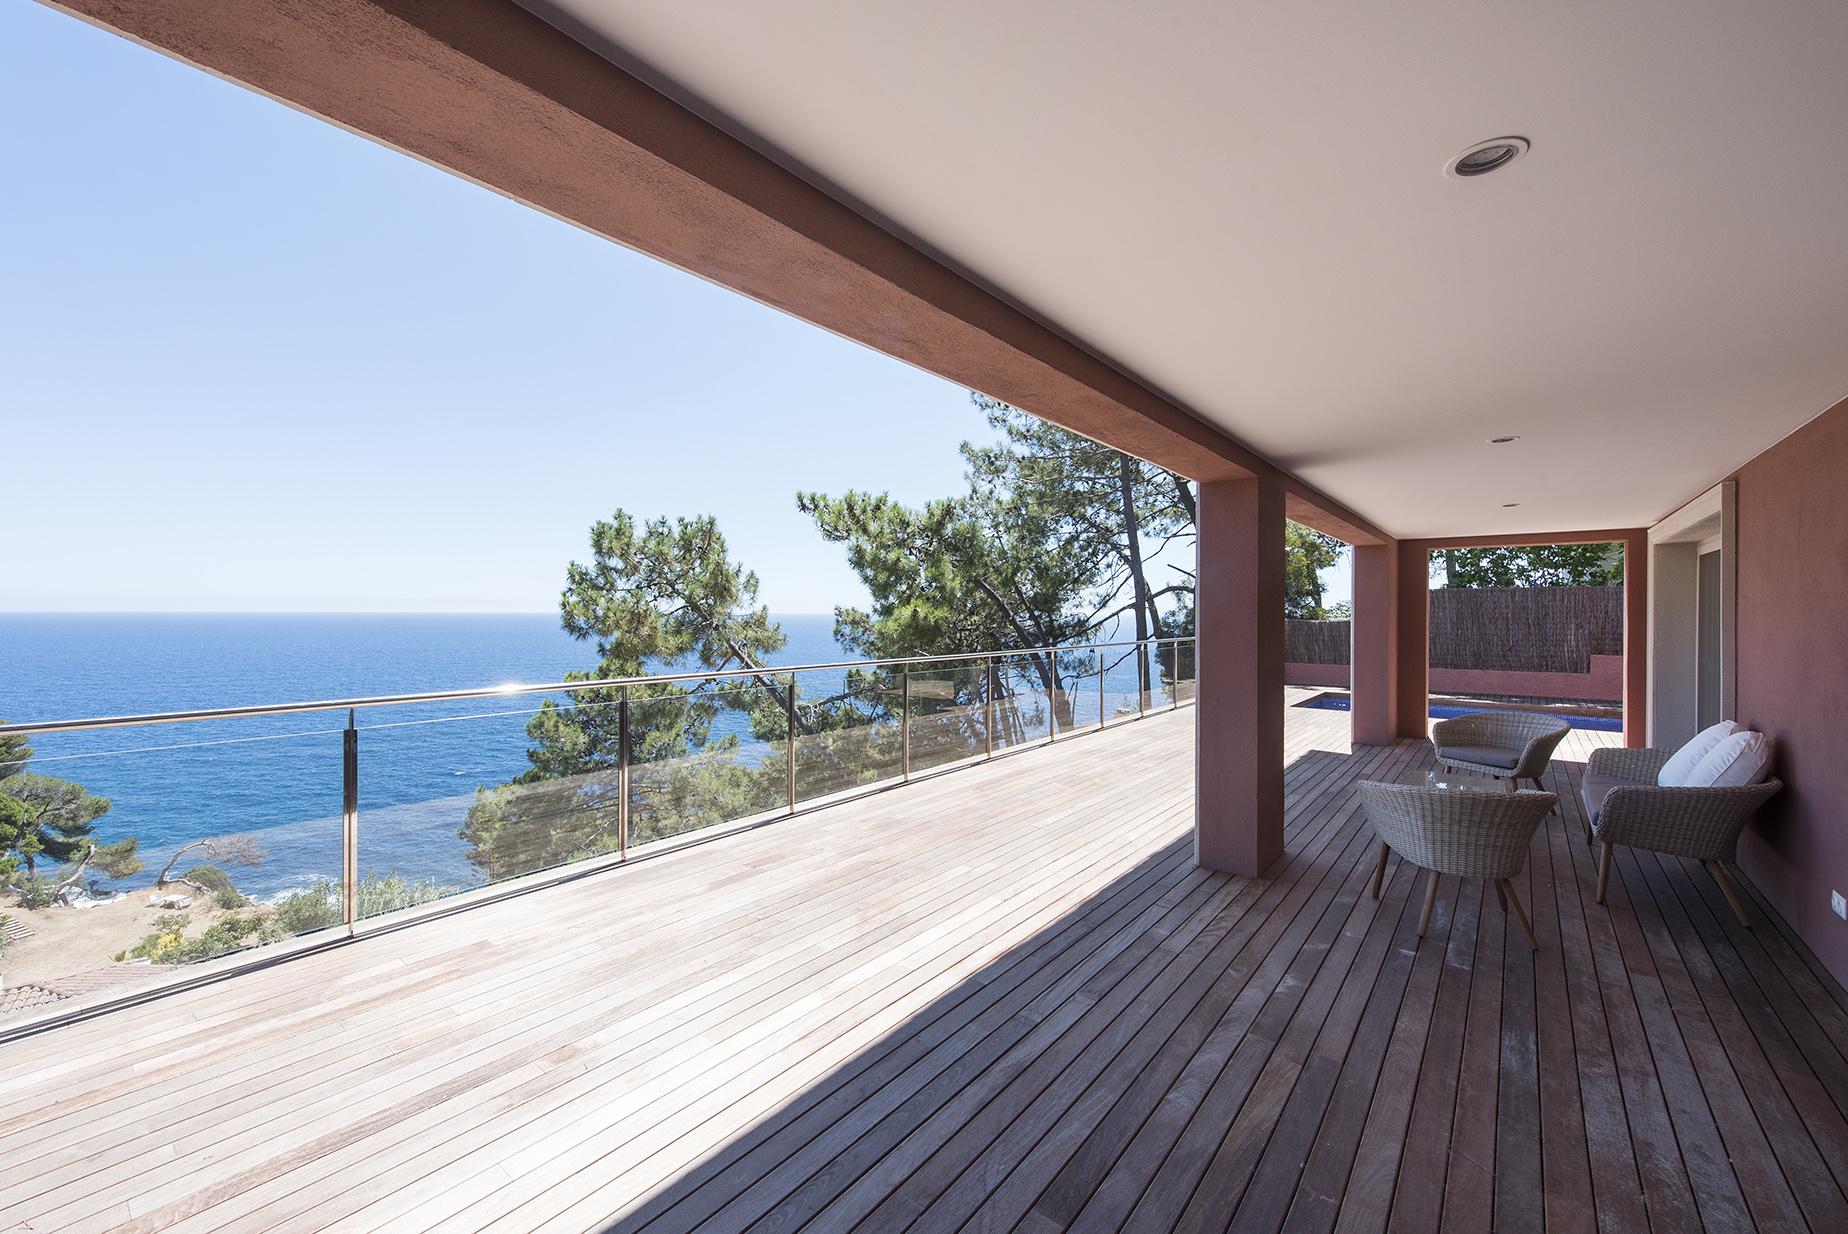 Single Family Home for Sale at Wonderful villa with sea views Lloret De Mar, Costa Brava, 17310 Spain